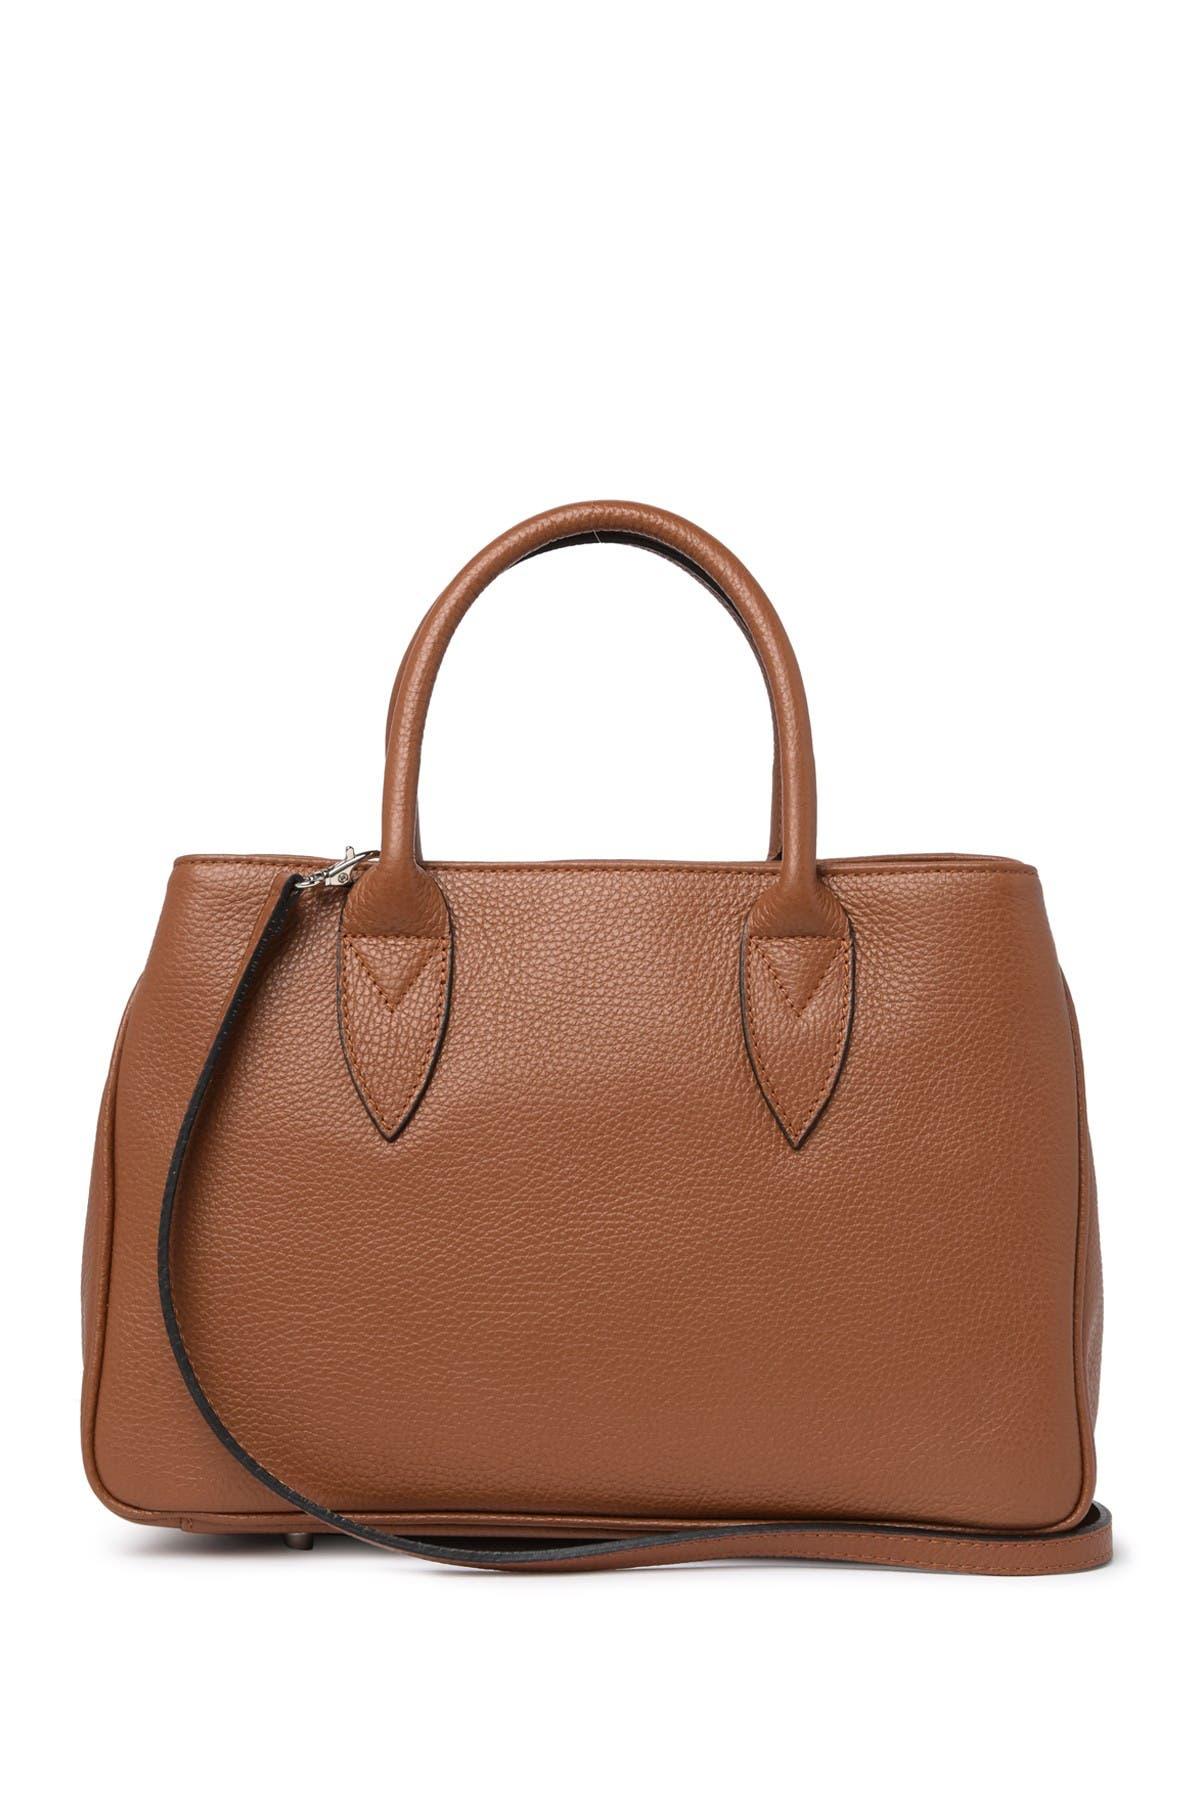 Image of Anna Luchini Leather Shopper Bag